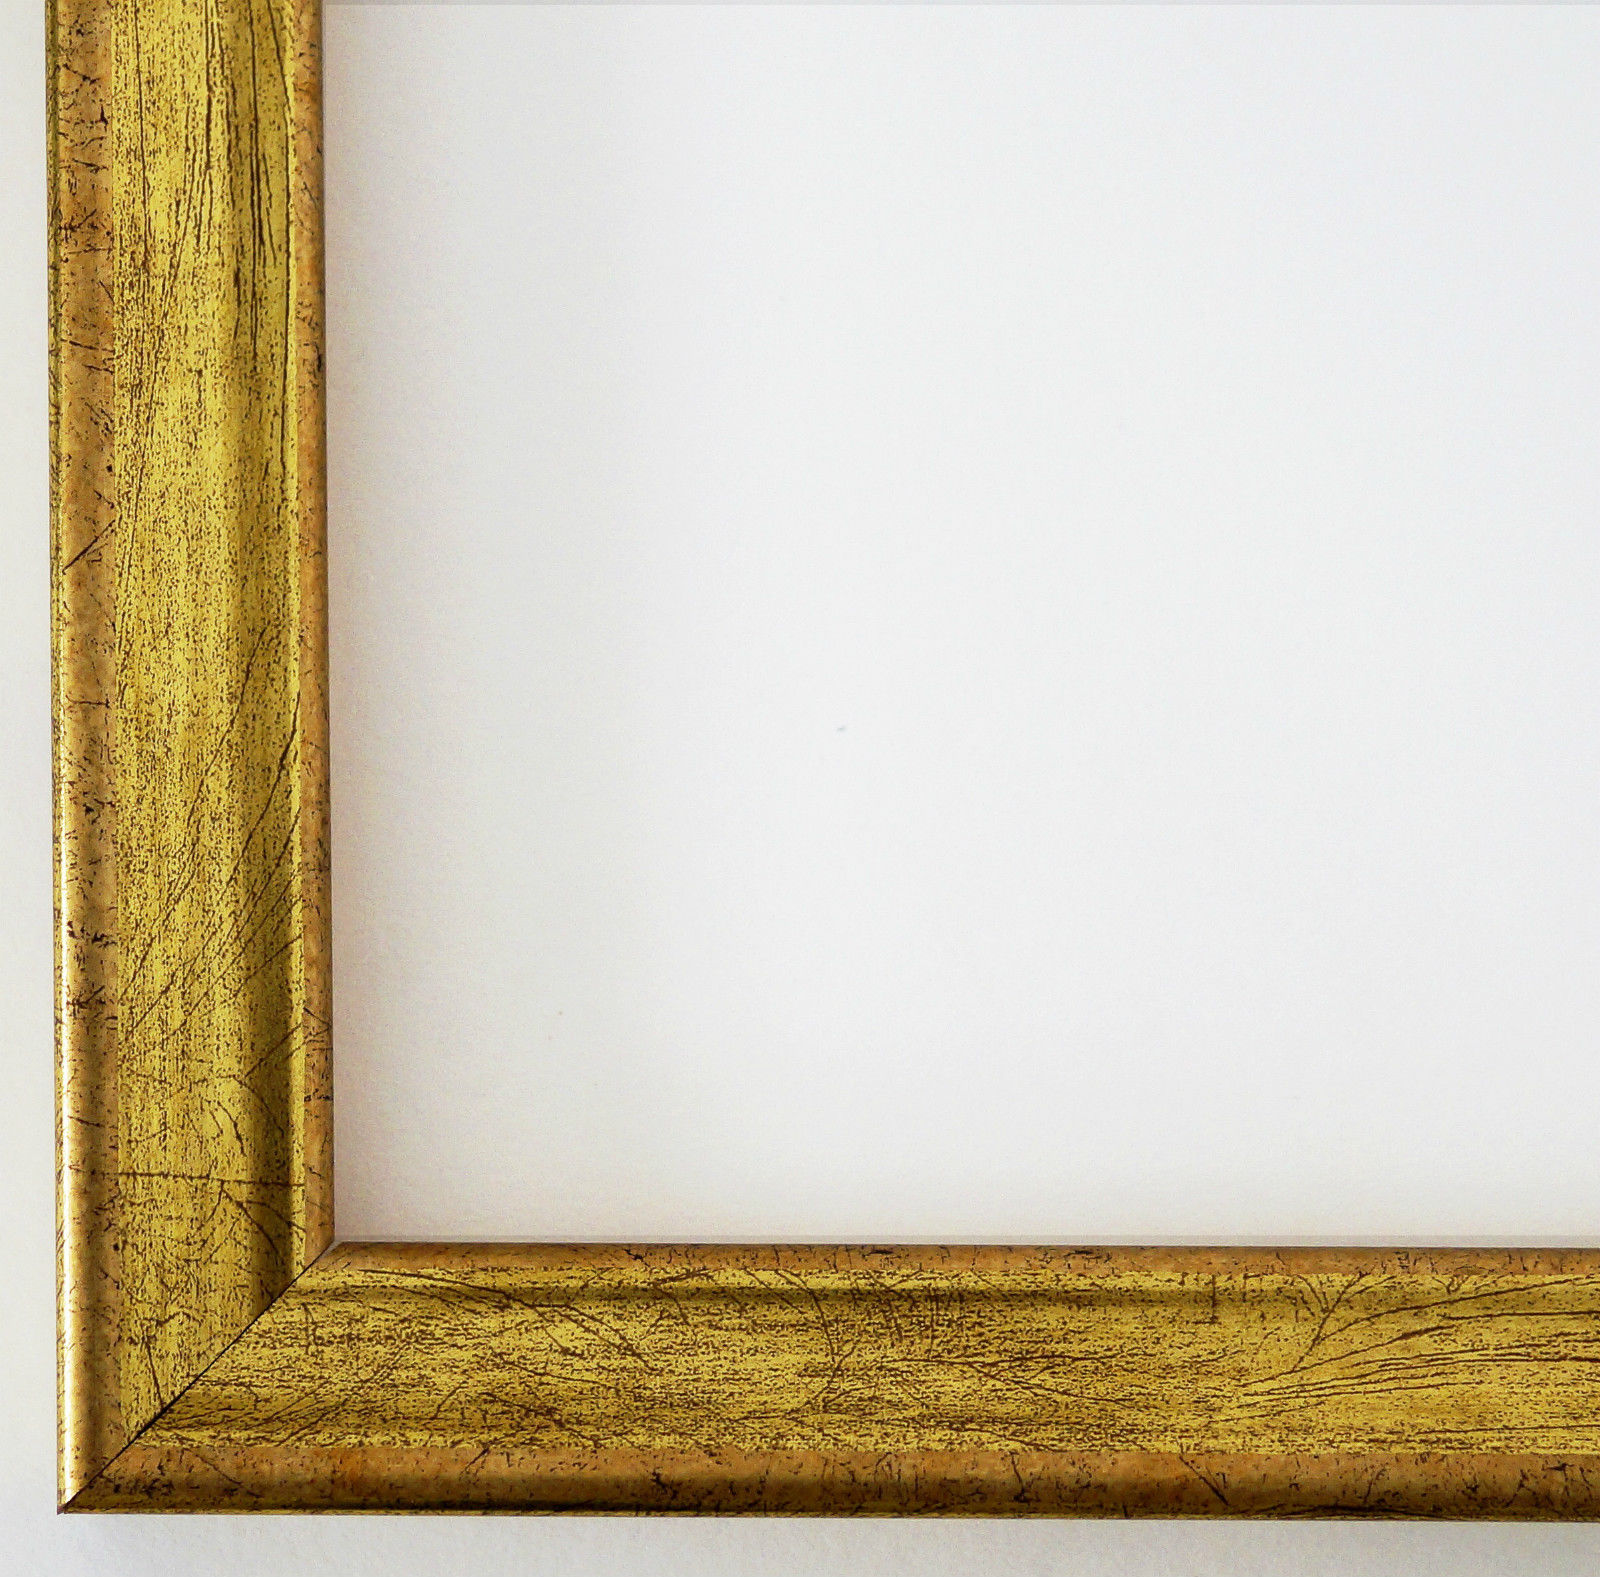 bilderrahmen barock gold bilderrahmen gold barock 56x46. Black Bedroom Furniture Sets. Home Design Ideas